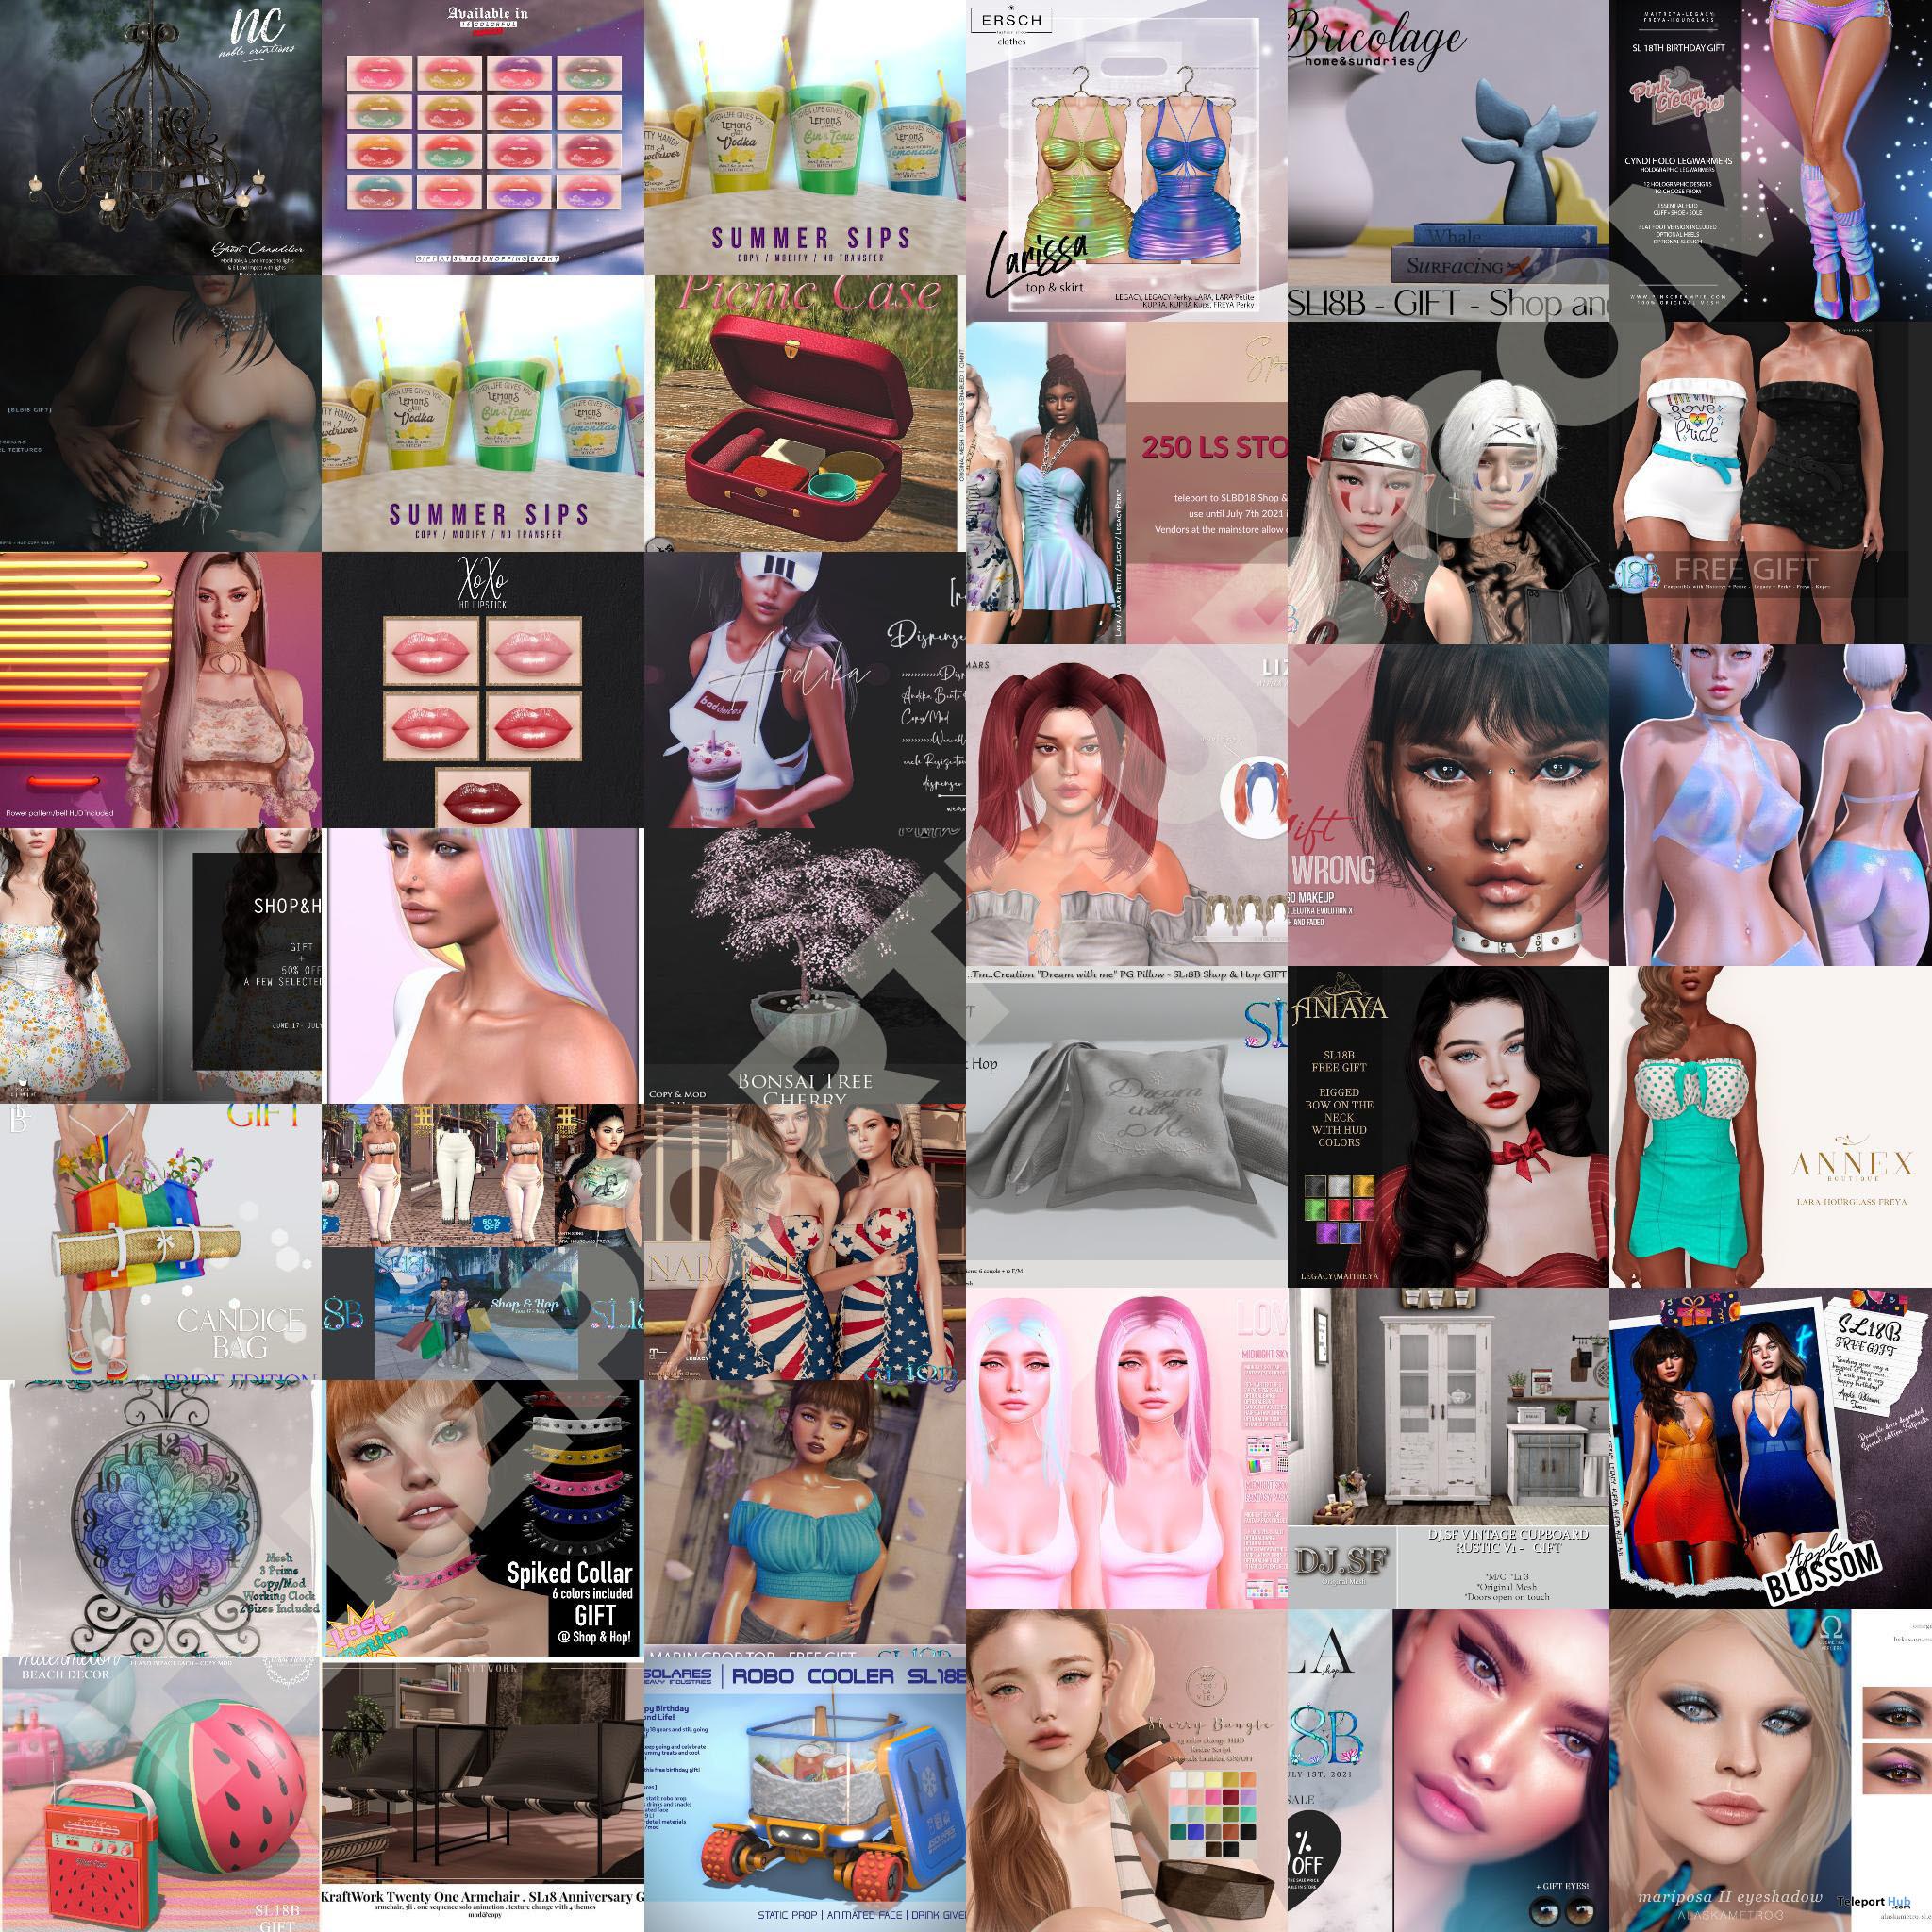 Several Gifts @ SL18B Shop & Hop Event June 2021 by Various Designers - Teleport Hub - teleporthub.com